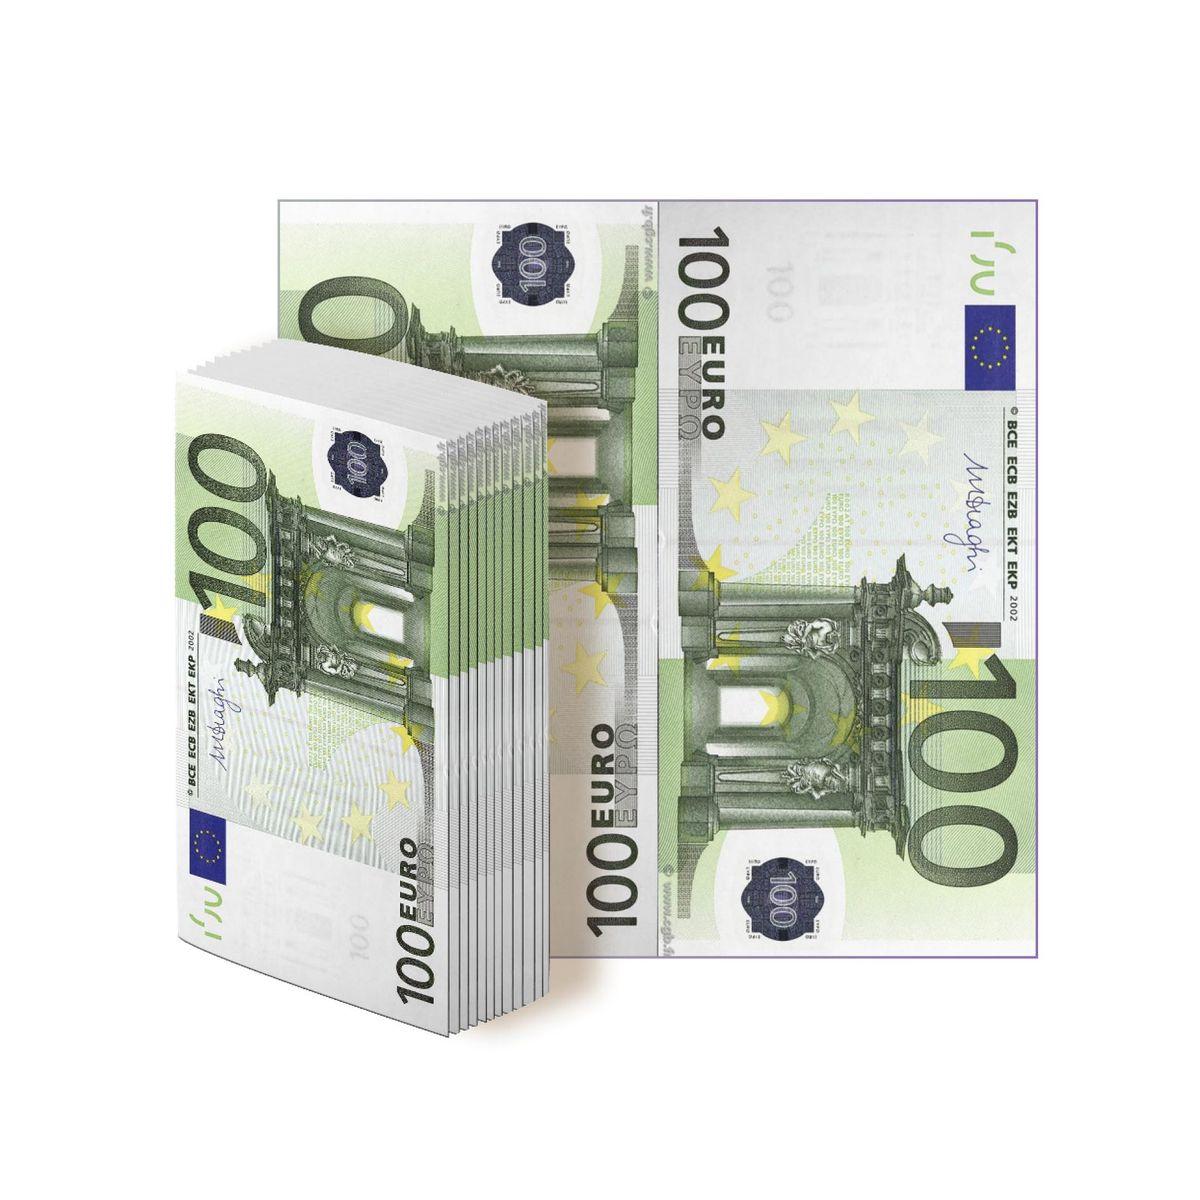 Салфетки бумажные Gratias 100 евро, трехслойные, 33 х 33 см, 12 шт бра 22 х 33 х 33